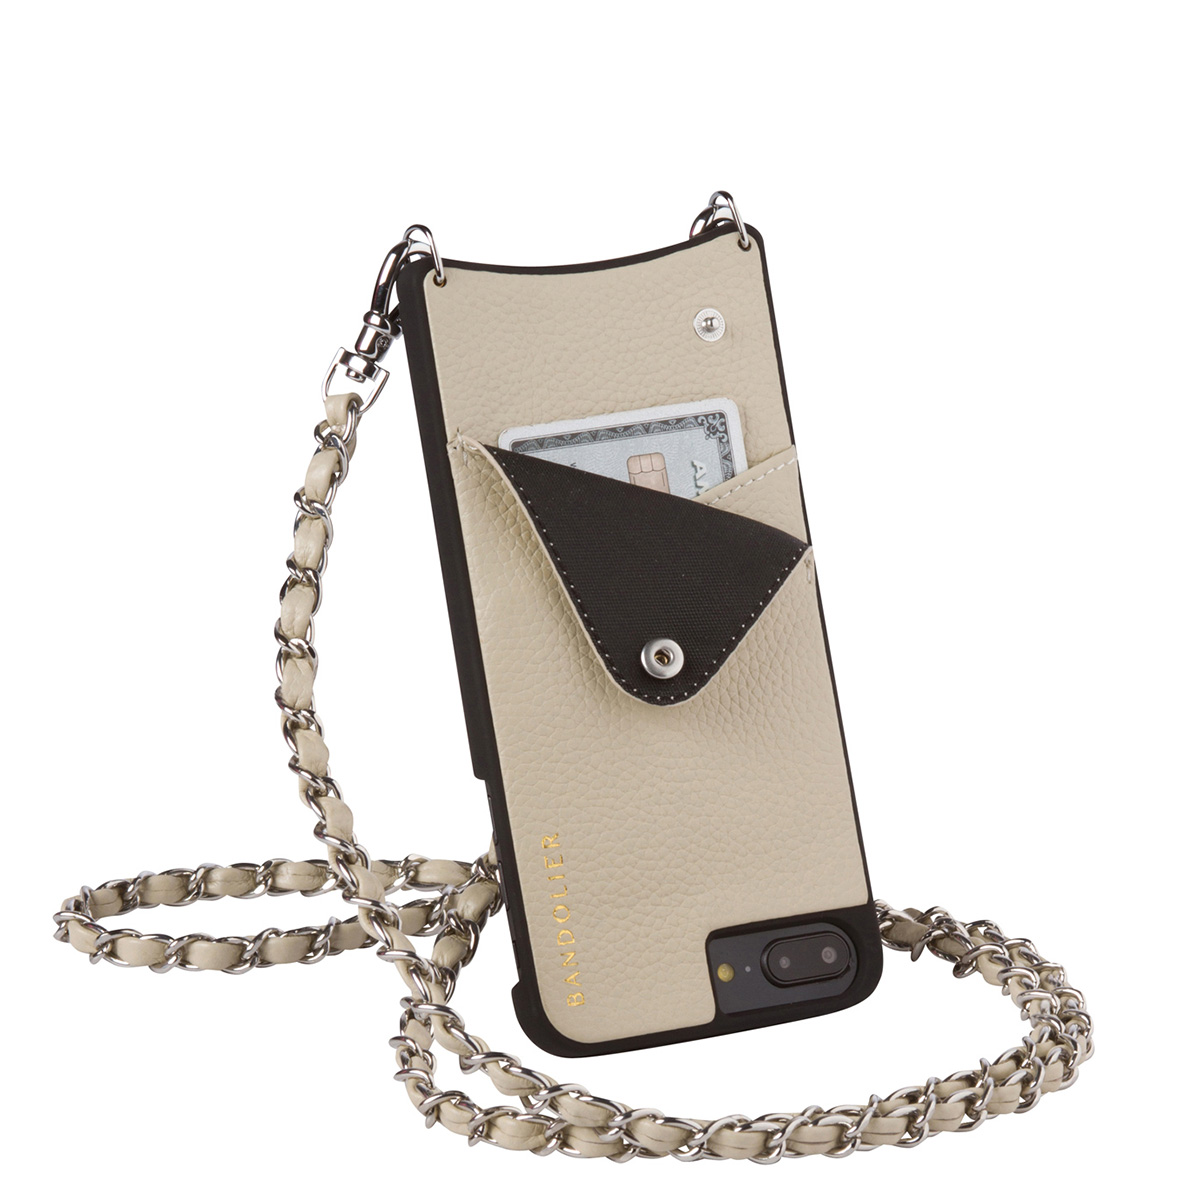 BANDOLIER LUCY IVORY バンドリヤー iPhone8 iPhone7 7Plus 6s ケース スマホ アイフォン プラス メンズ レディース [8/1 新入荷] [187]